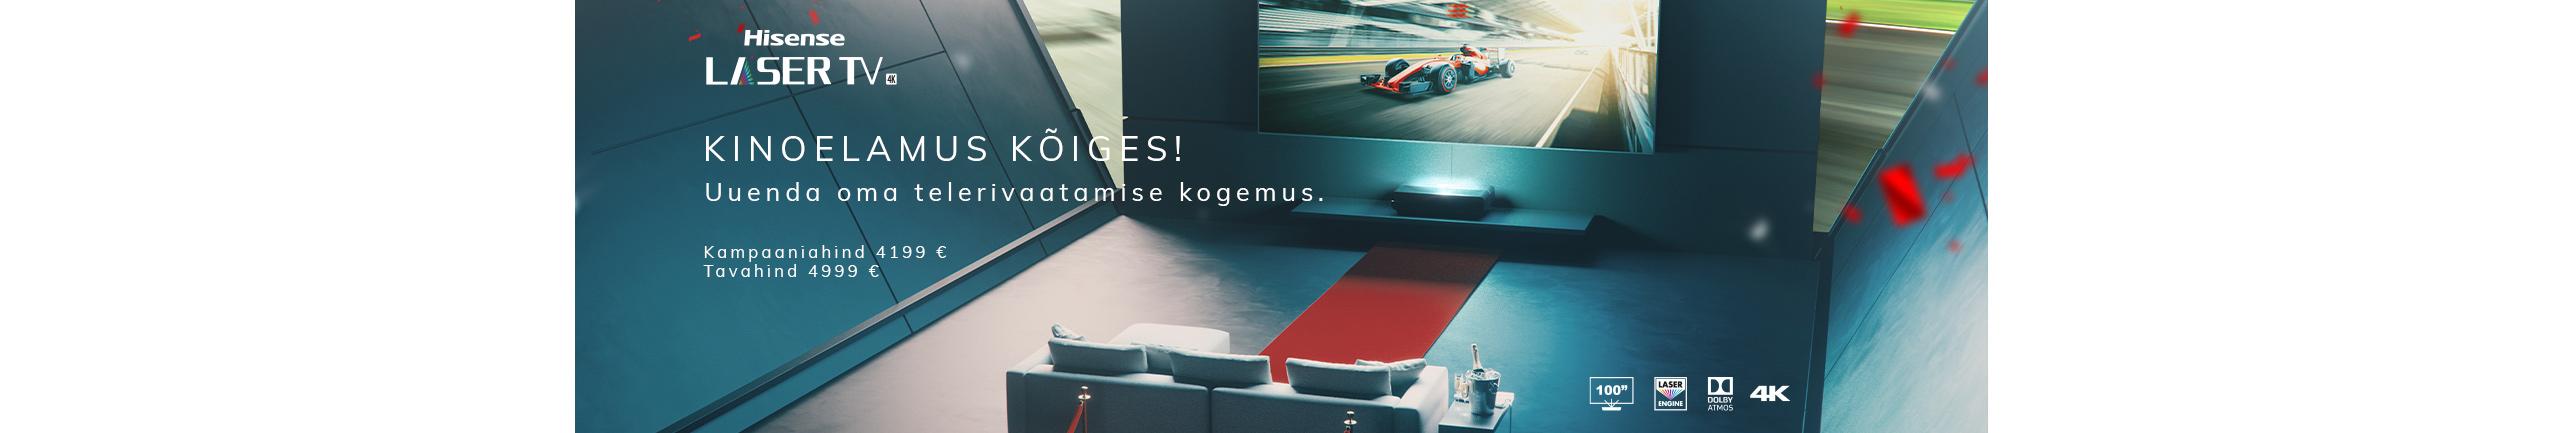 Hisense Laser TV 4k